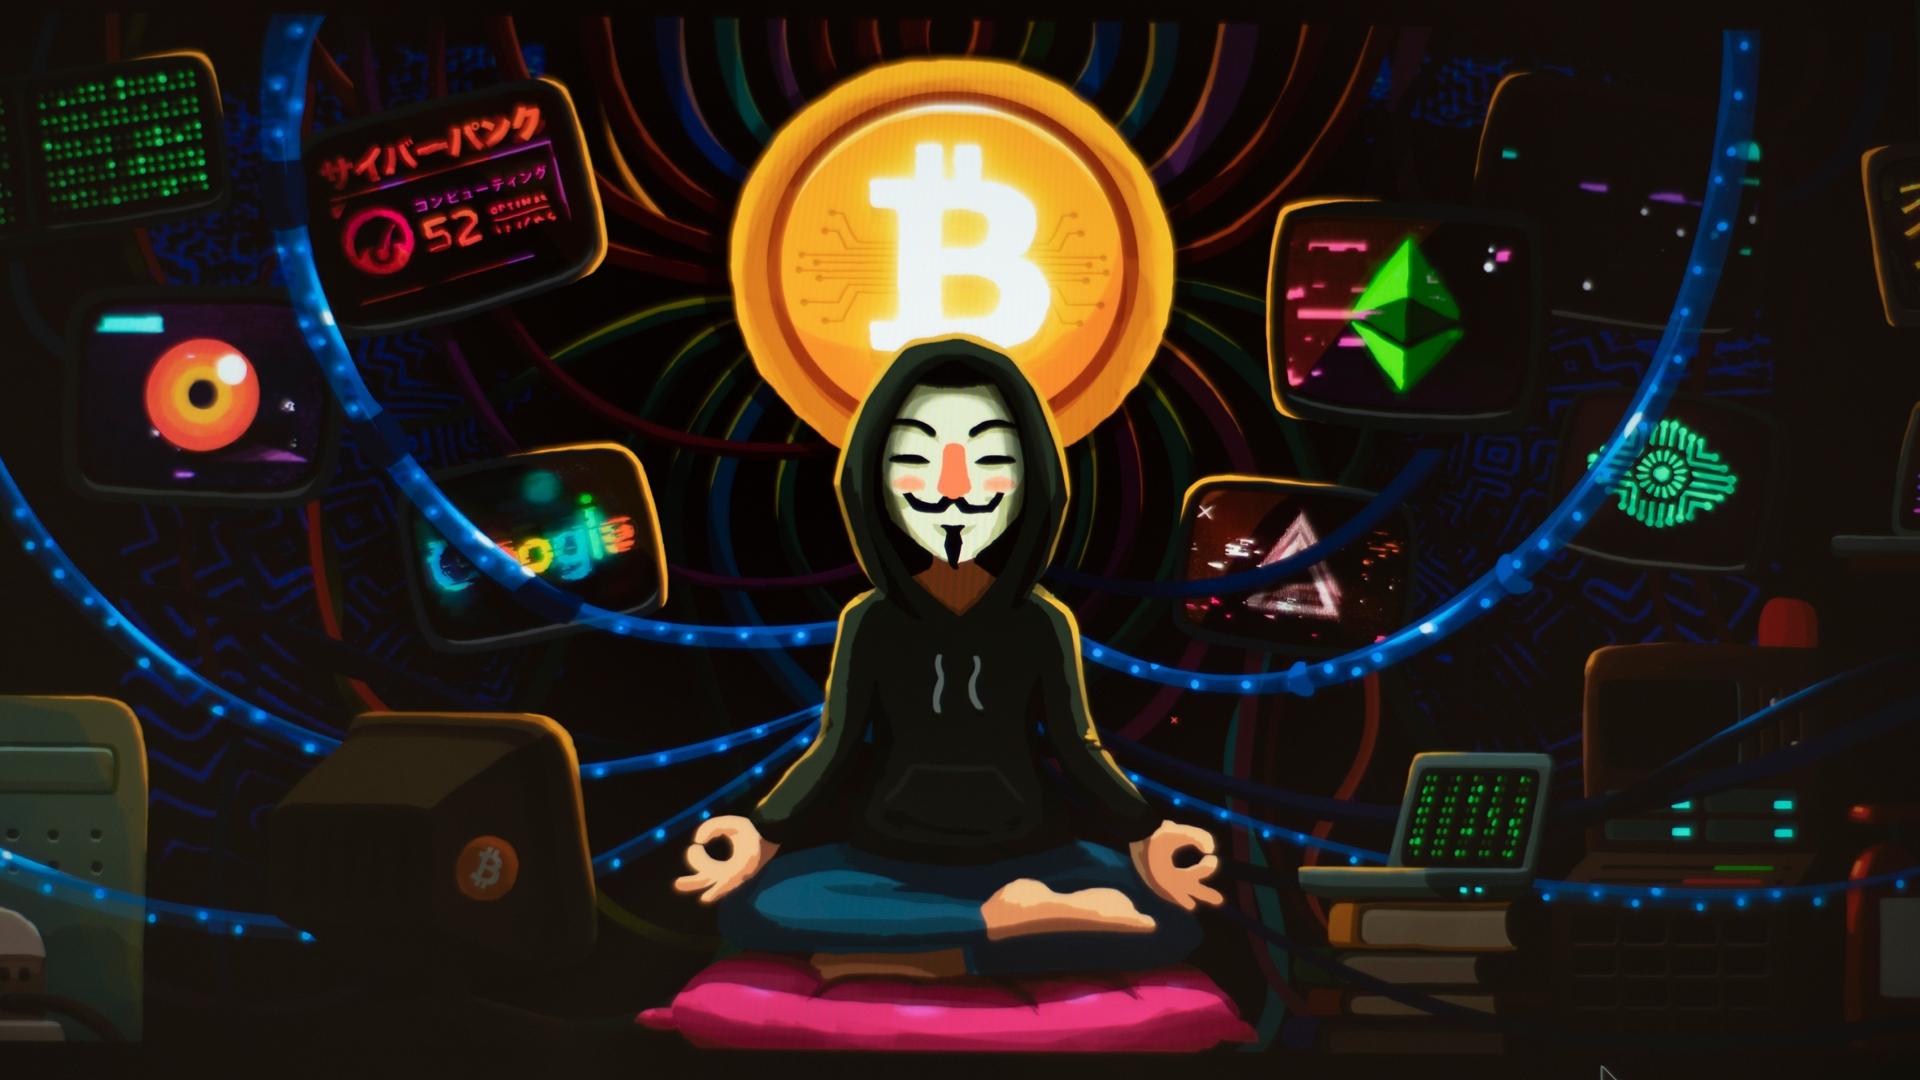 Download 1920x1080 Wallpaper Meditation Art Anonymous Hacker Bitcoin Full Hd Hdtv Fhd 1080p 1920x1080 Hd Image Background 21755